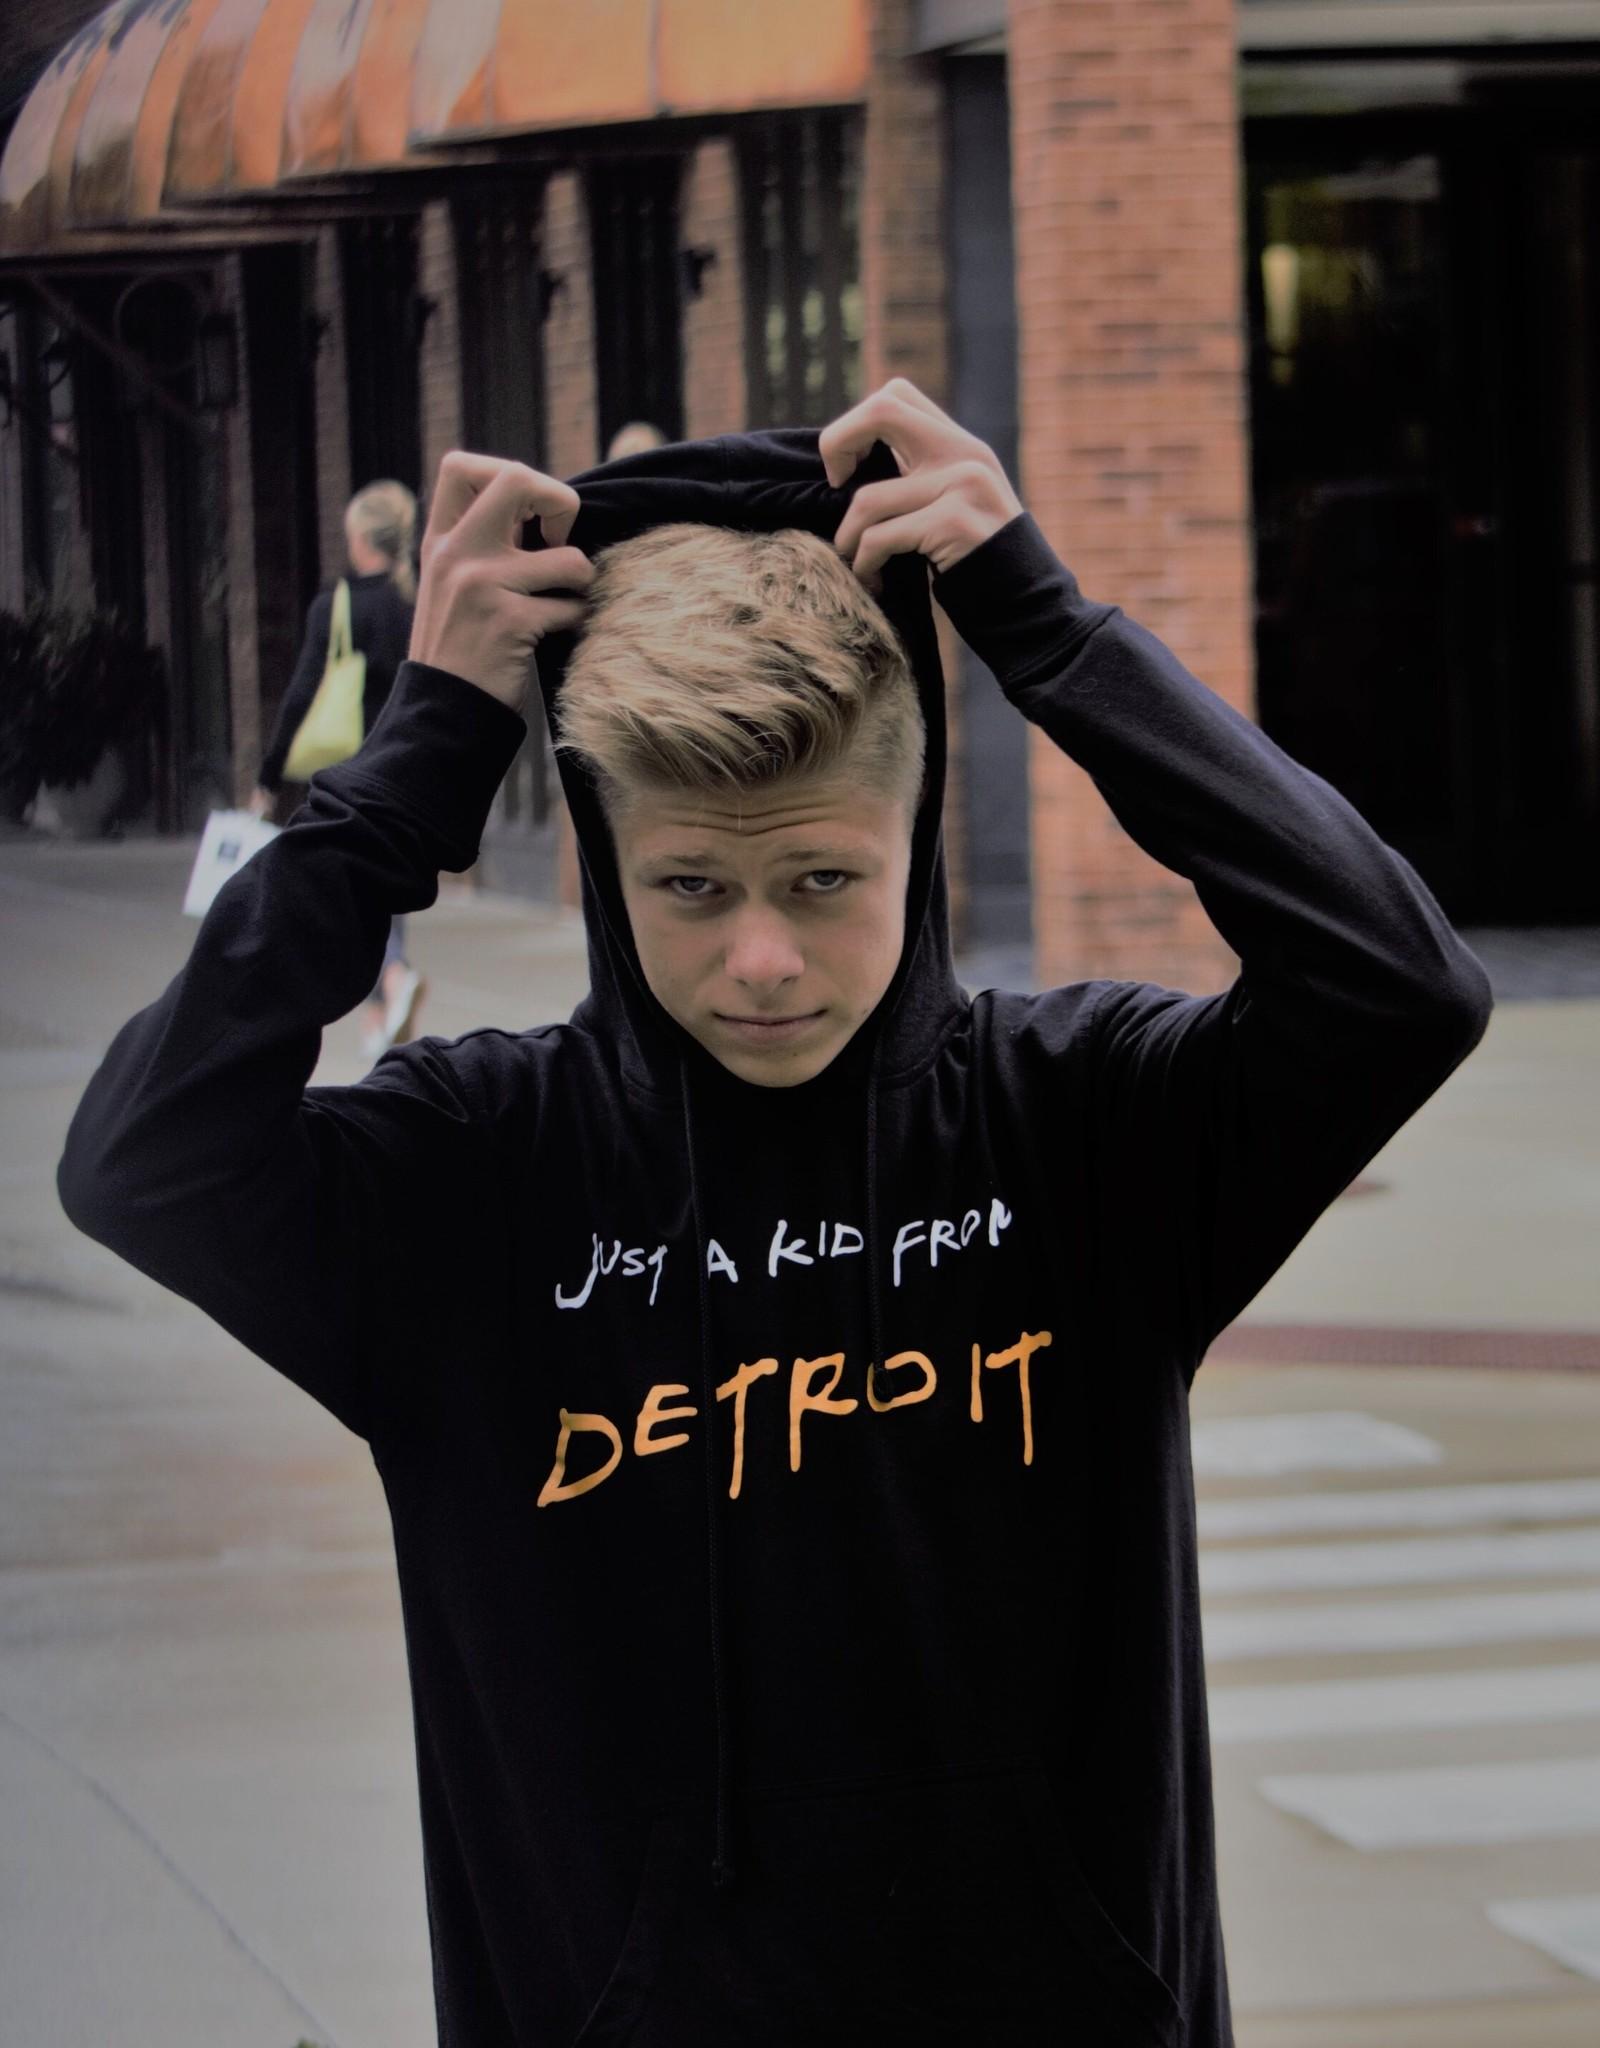 Untied Just a kid from Detroit Sweatshirt